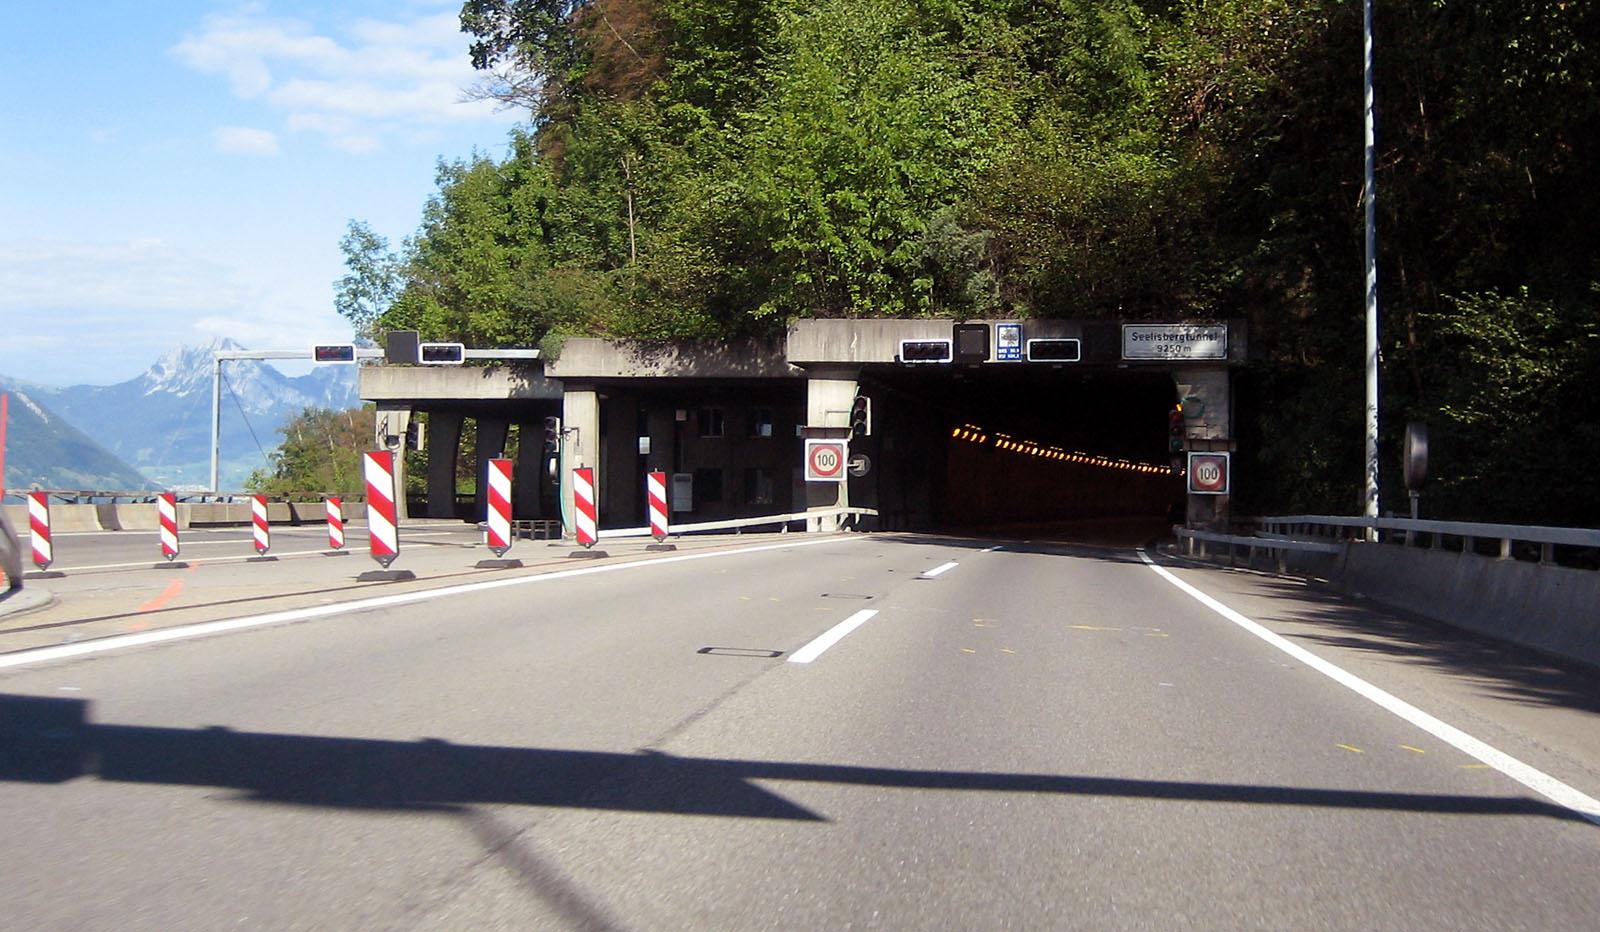 https://upload.wikimedia.org/wikipedia/commons/d/d0/Seelisbergtunnel_Nordportal.jpg